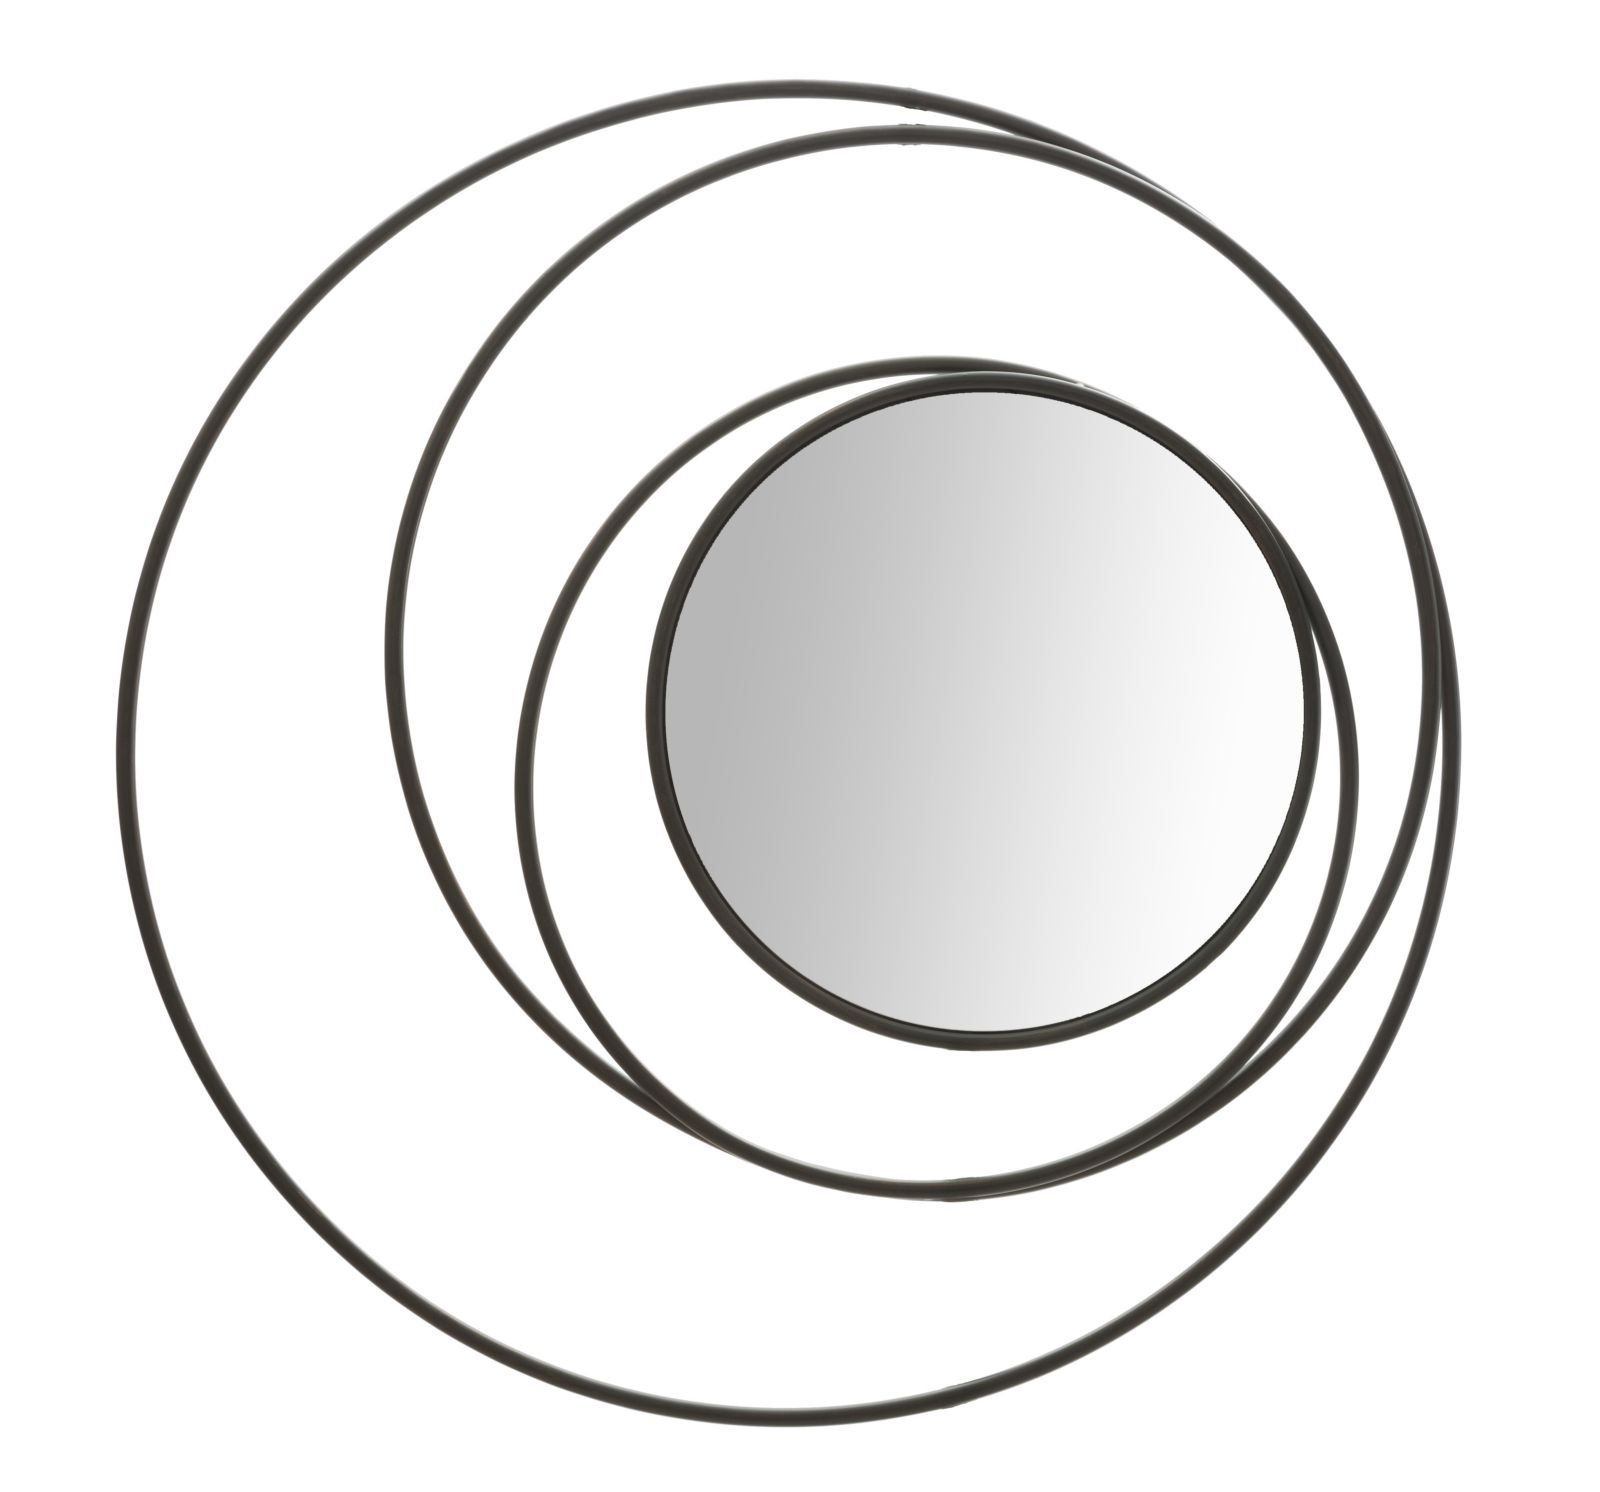 Oglinda decorativa din metal Circles Negru, Ø80 cm imagine